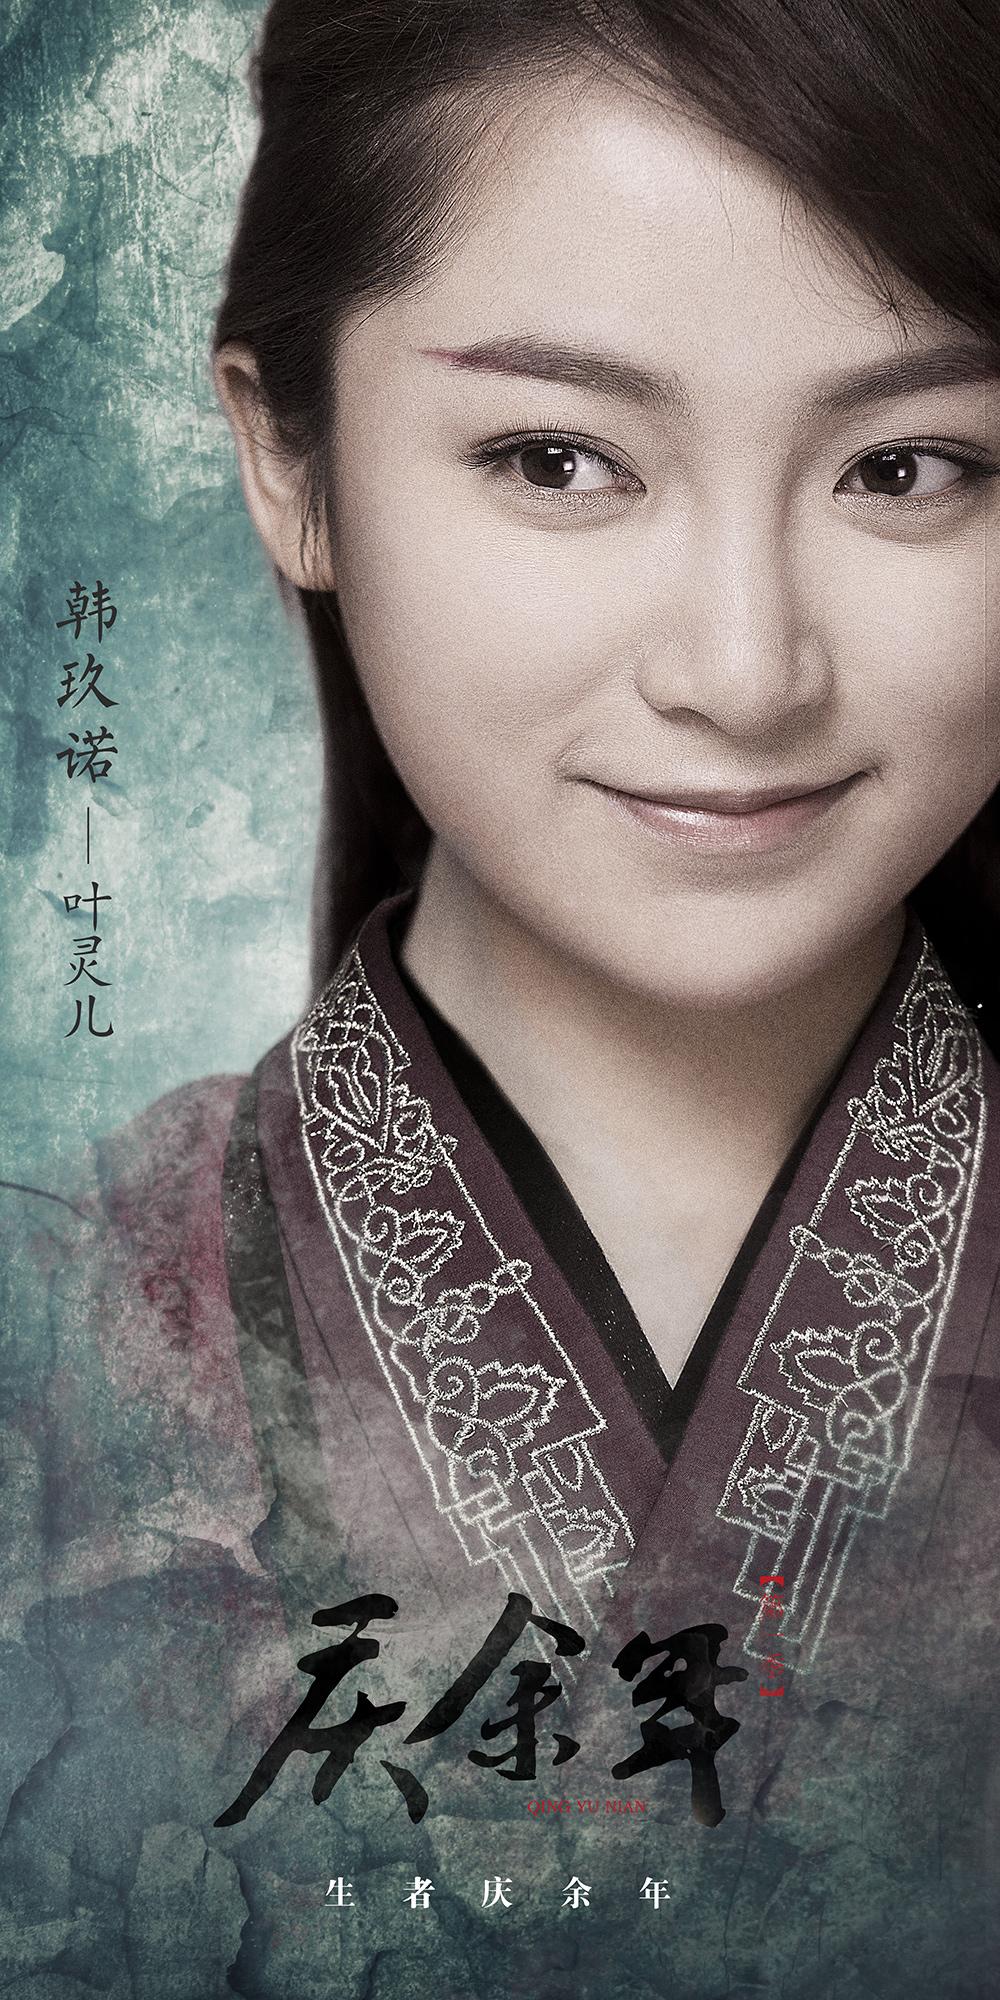 Chun yu xin dissertation